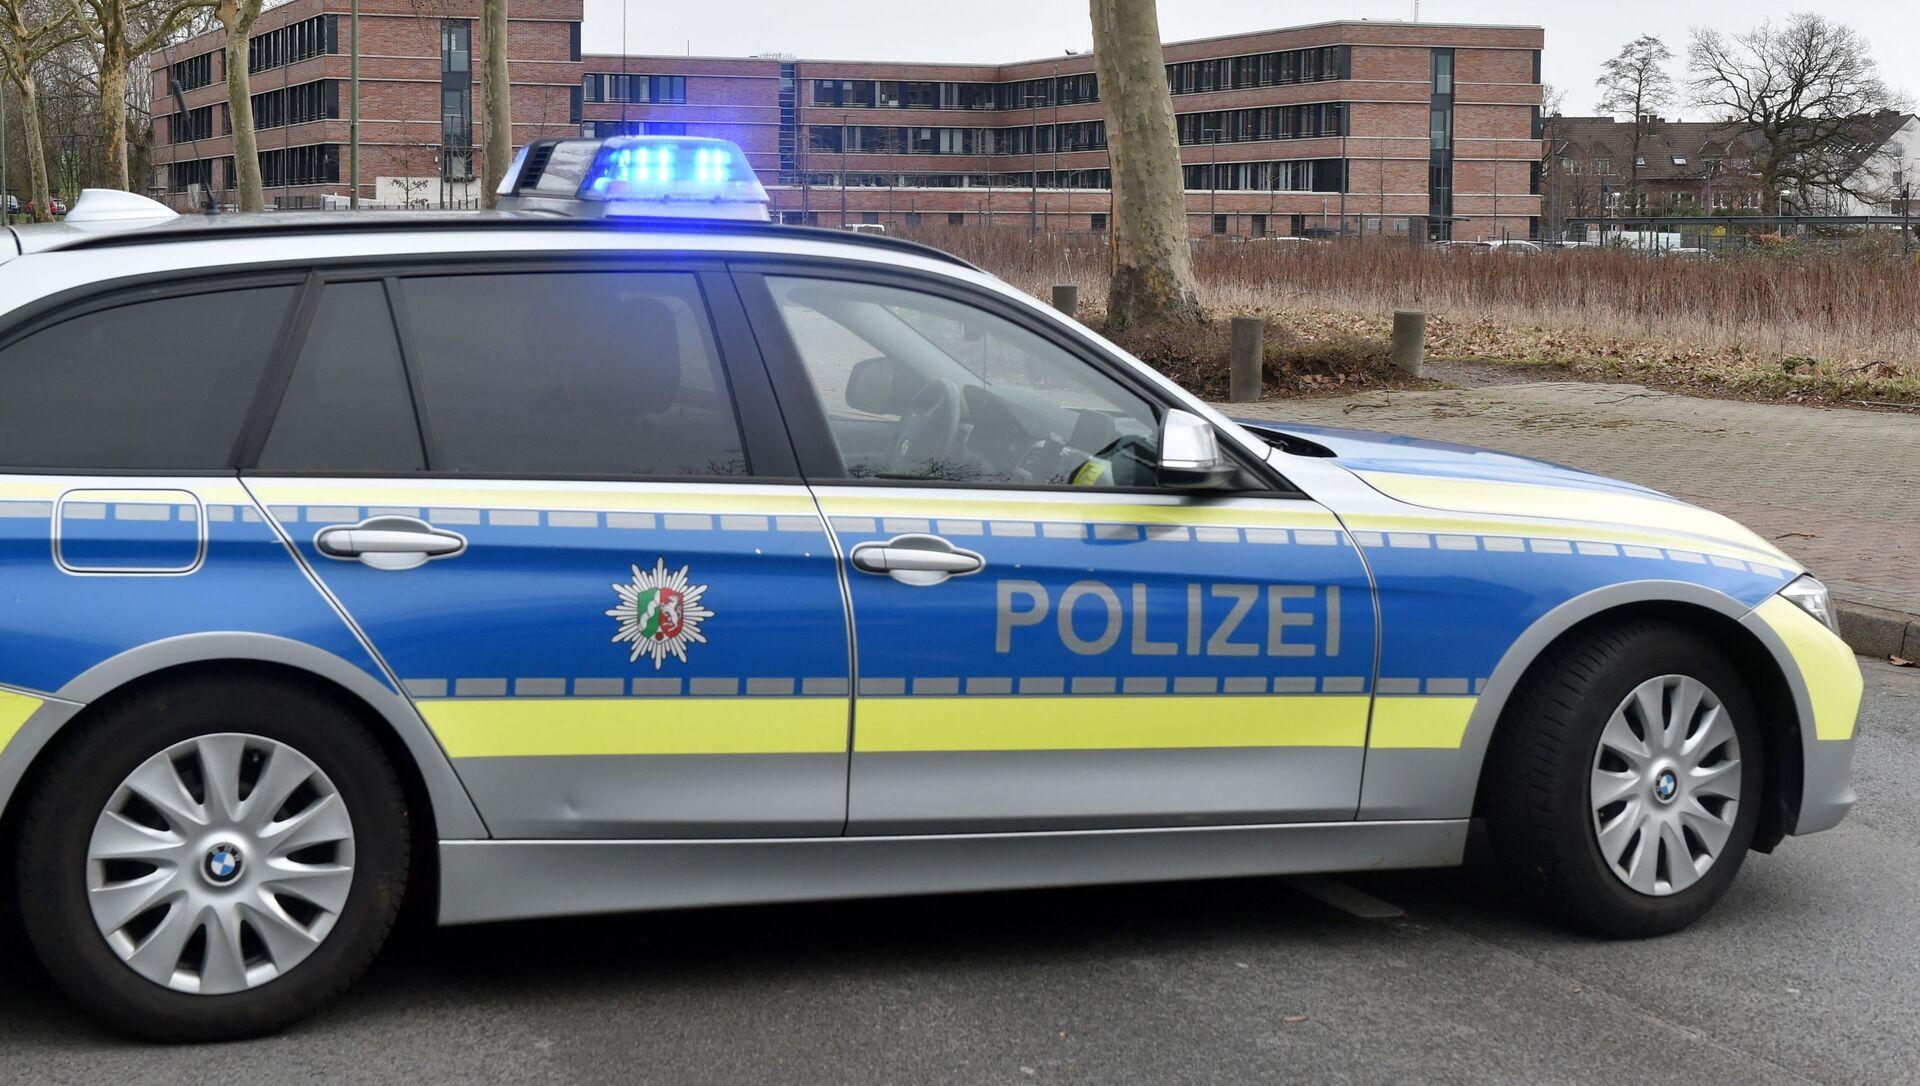 German police car  - Sputnik International, 1920, 30.07.2021